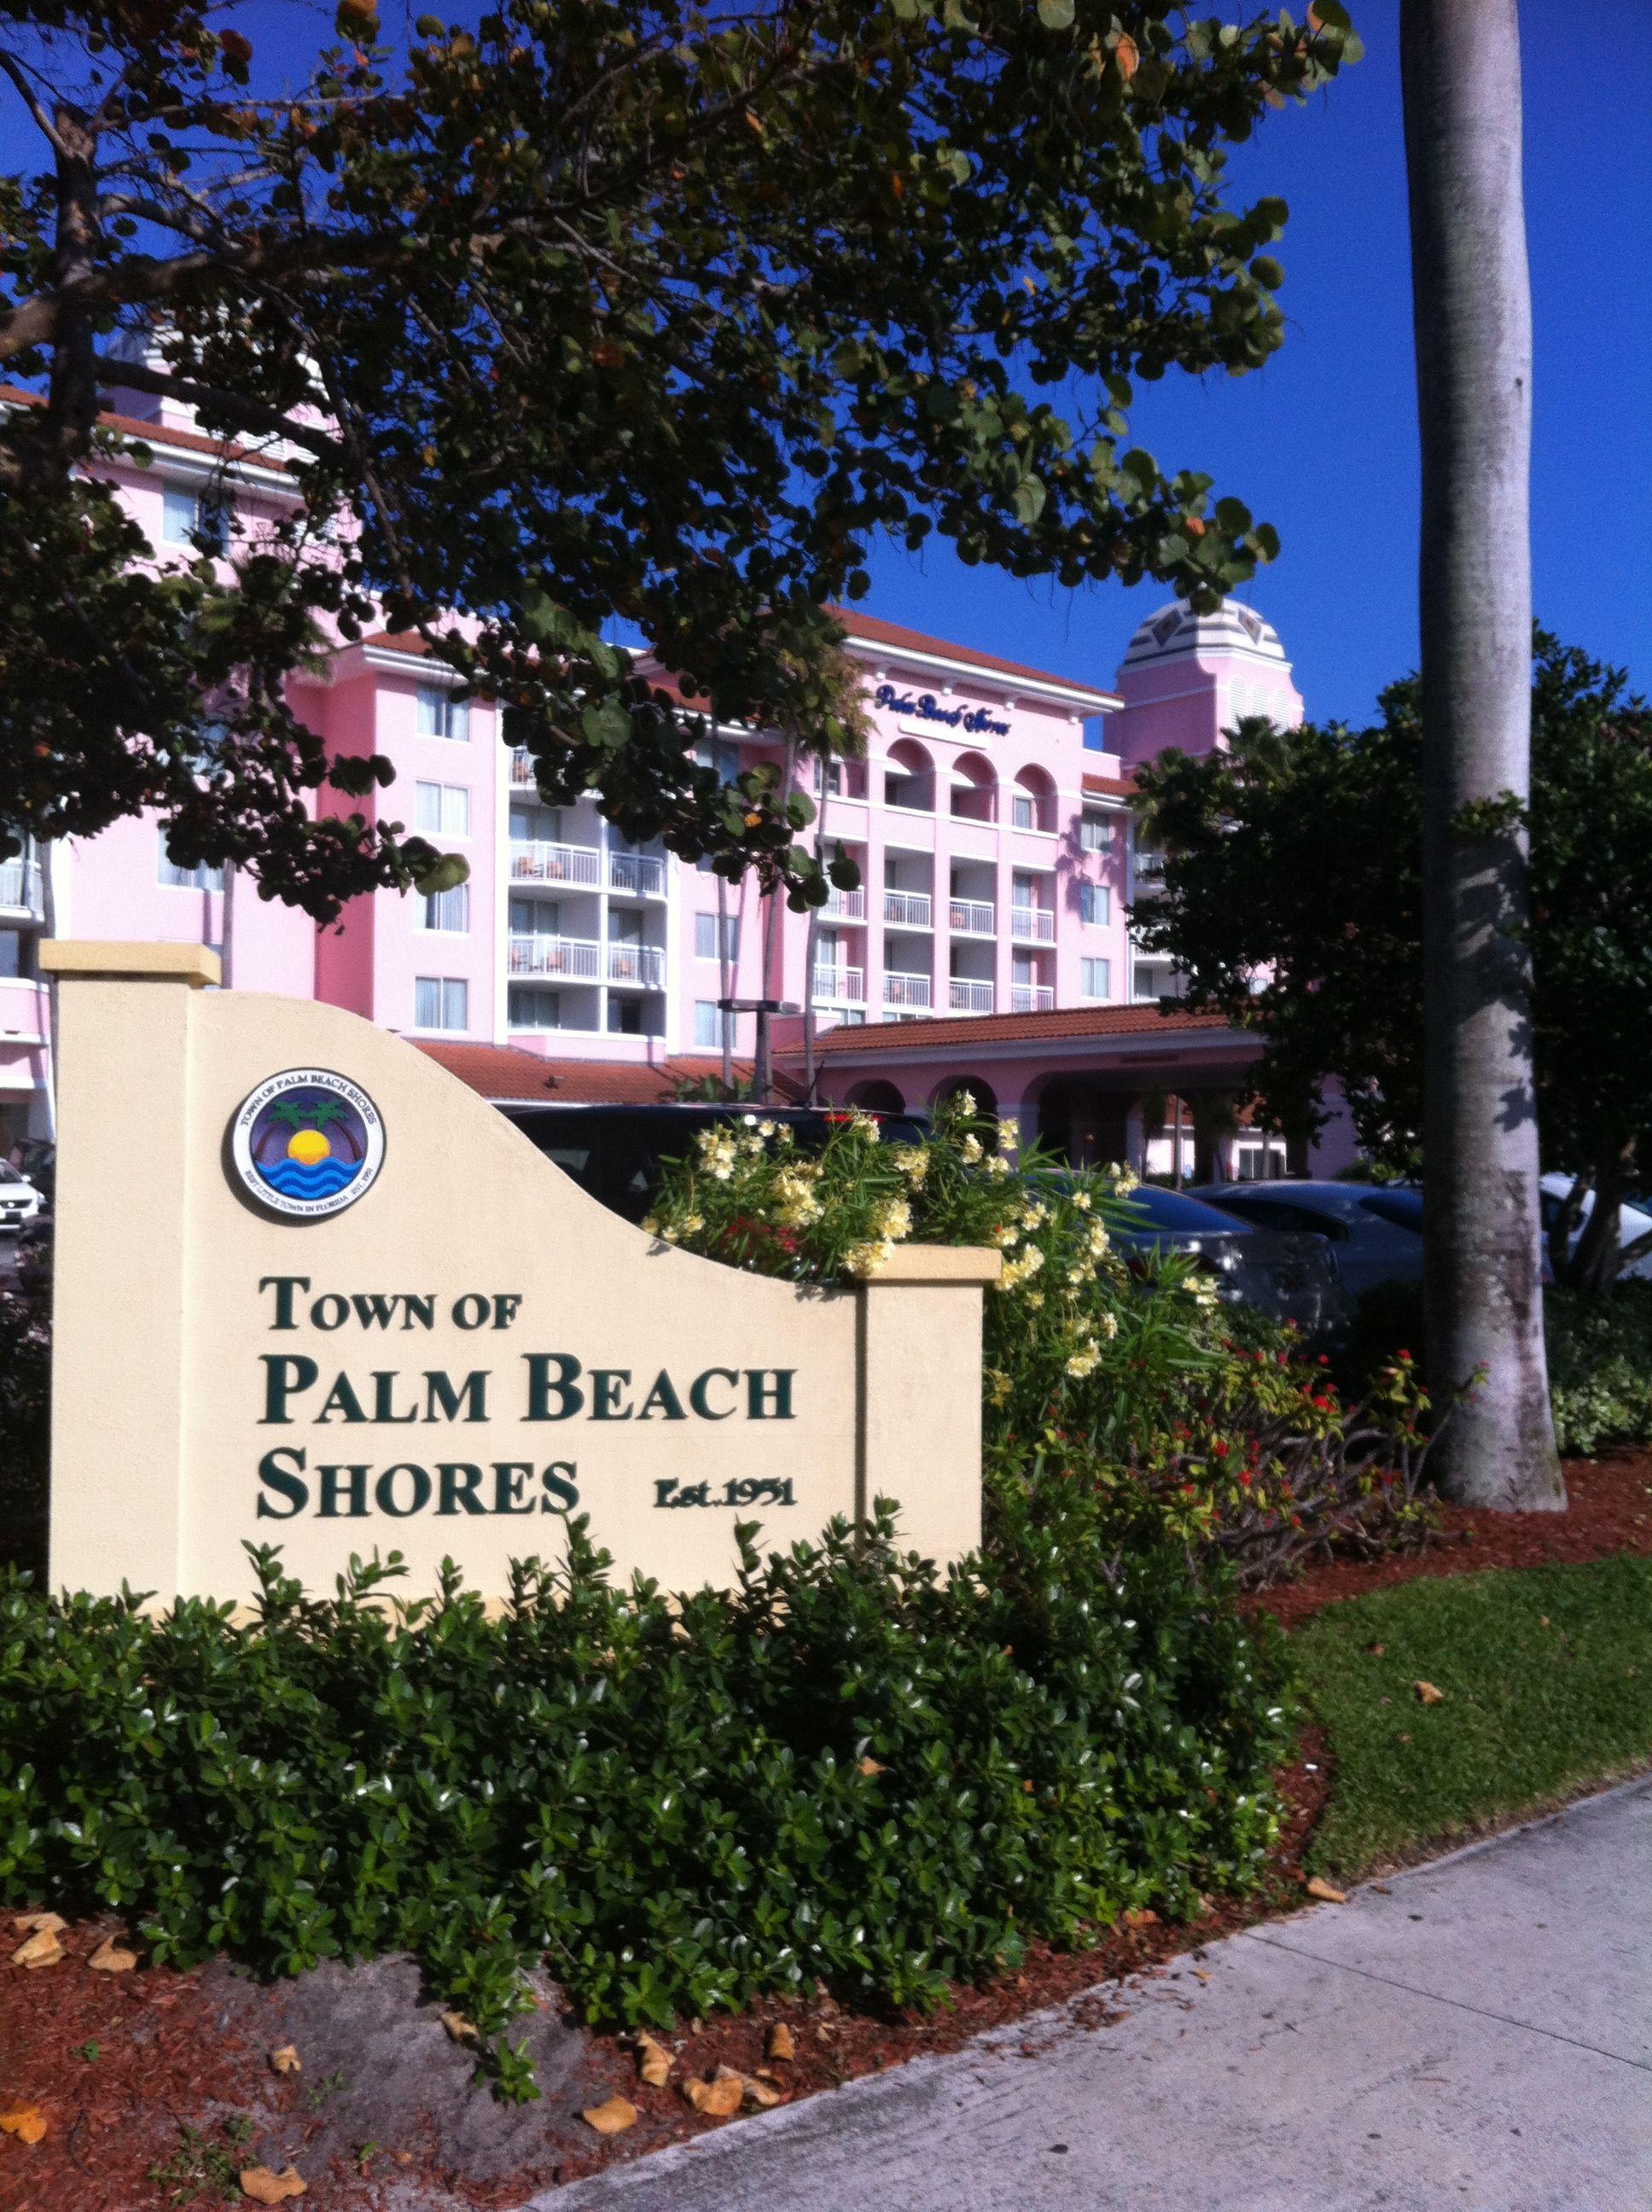 c4006e4a68d838a689e14468c86b3586 - Melting Pot In Palm Beach Gardens